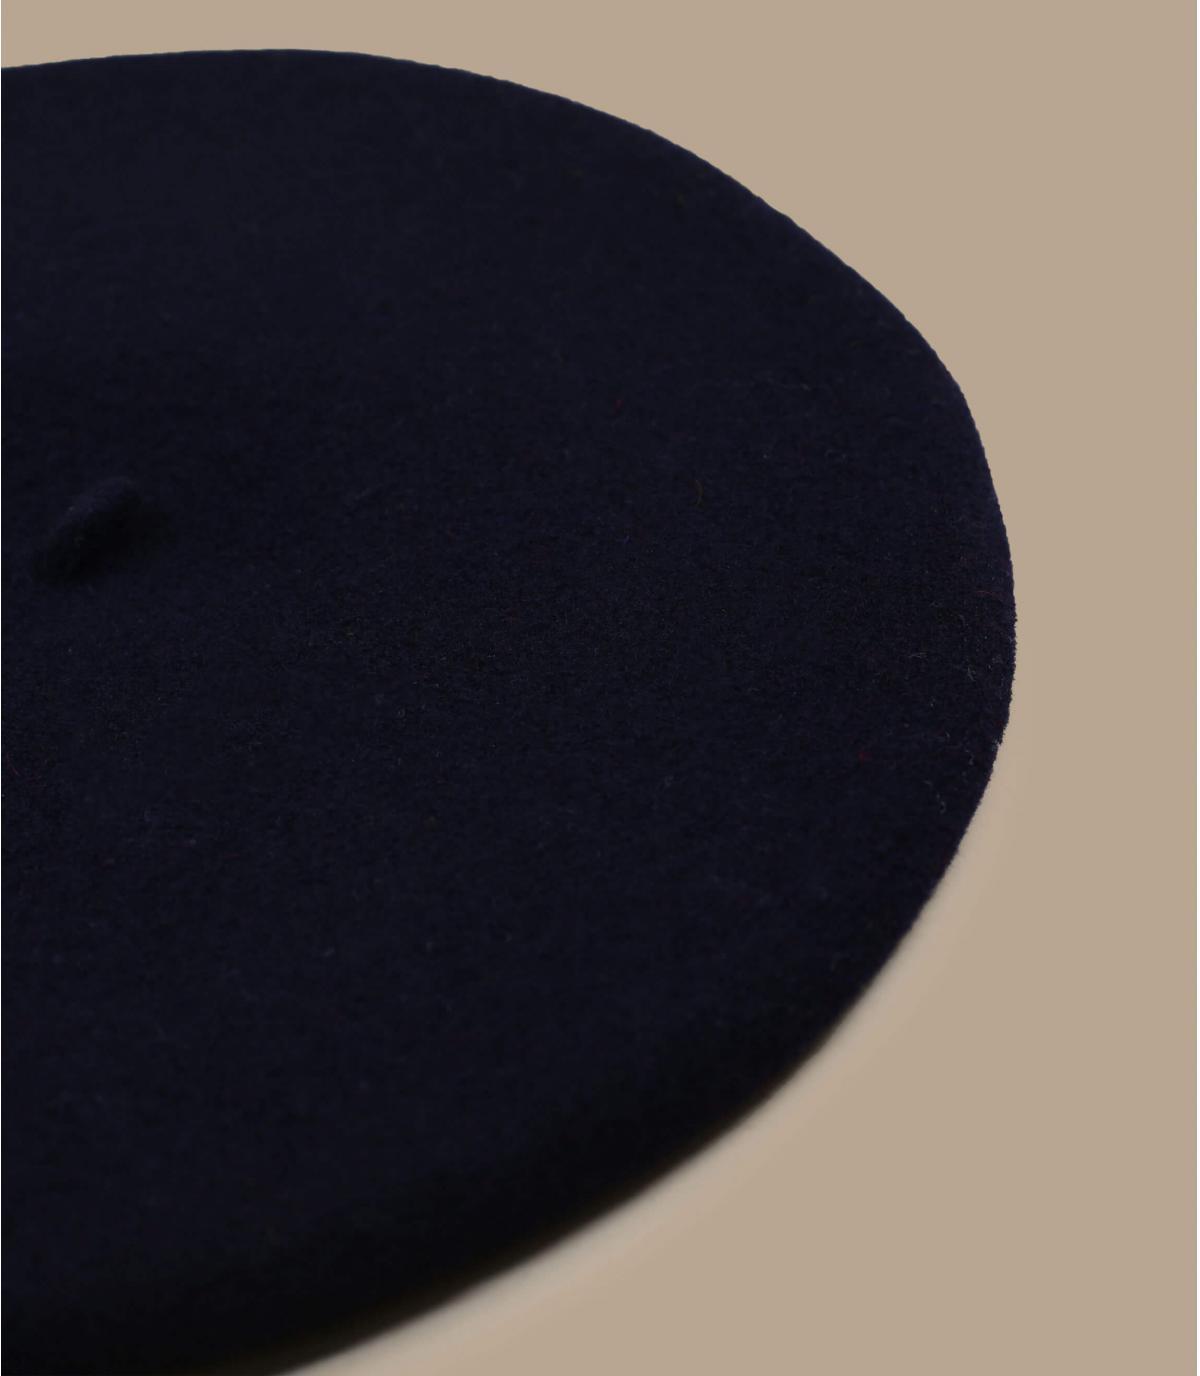 Detalles Boina paris azul marino imagen 2